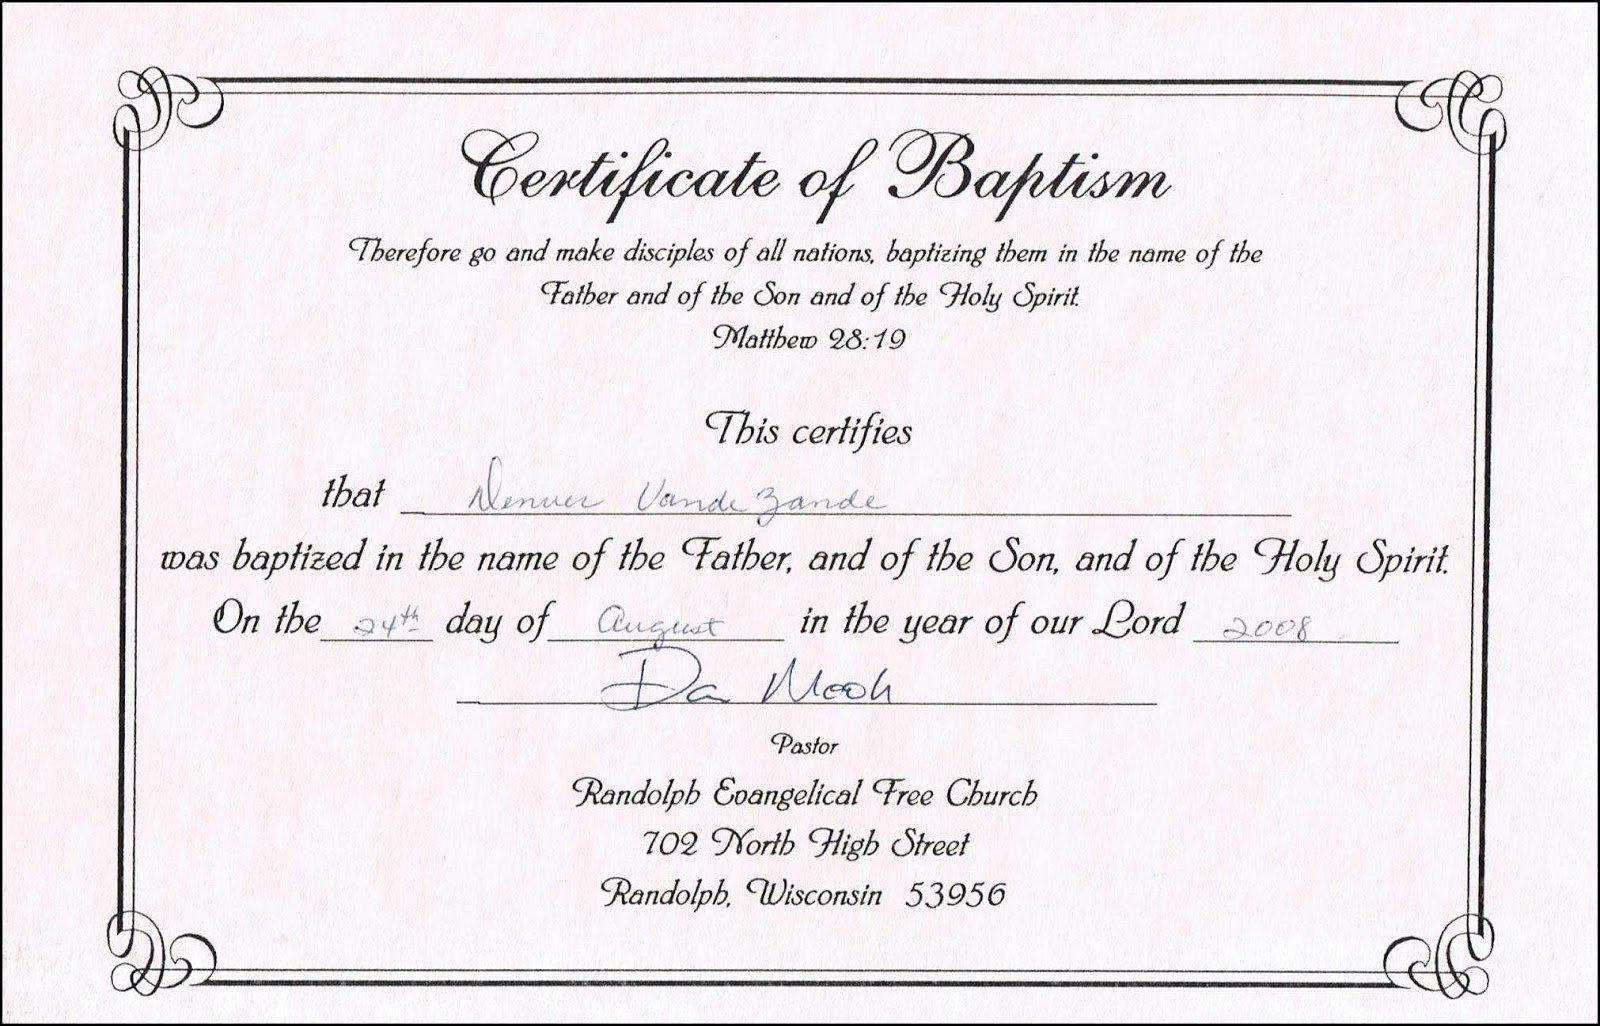 Baby Dedication Certificate Template Word Fresh Sample Baptism Certificate Templates